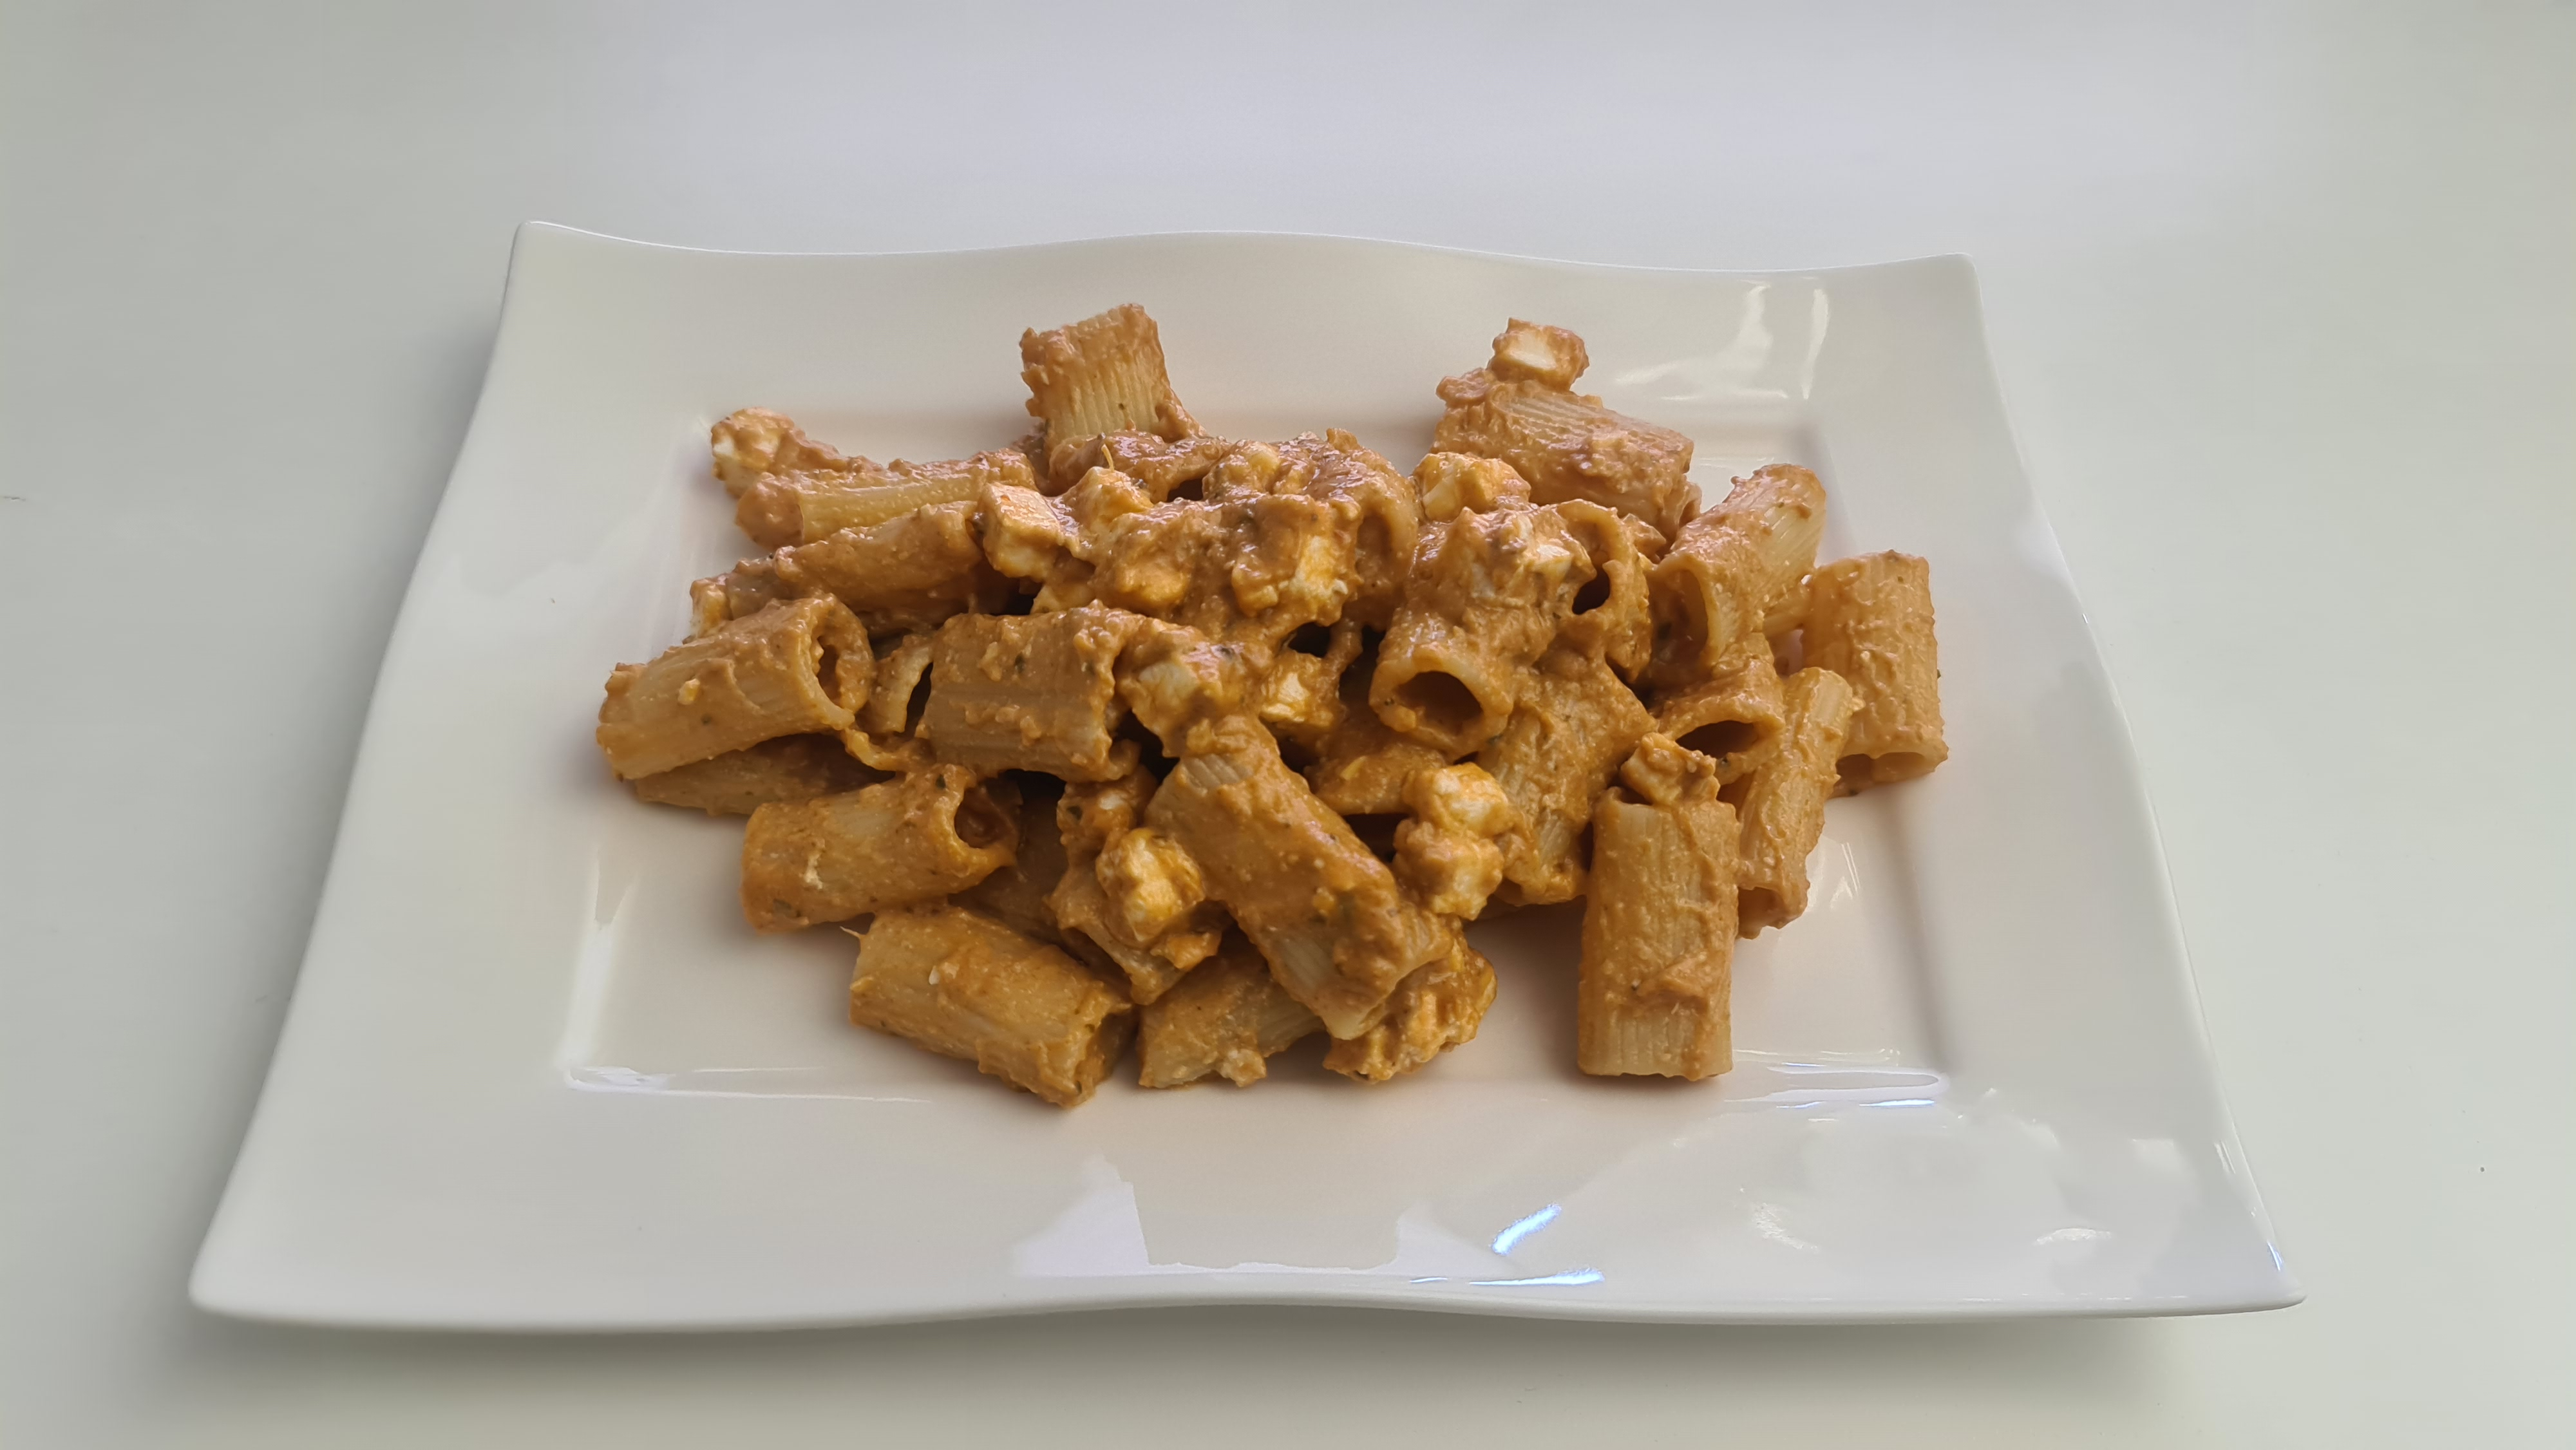 https://foodloader.net/Holz_2020-07-21_Rigatoni_Ricotta_e_Noci.jpg